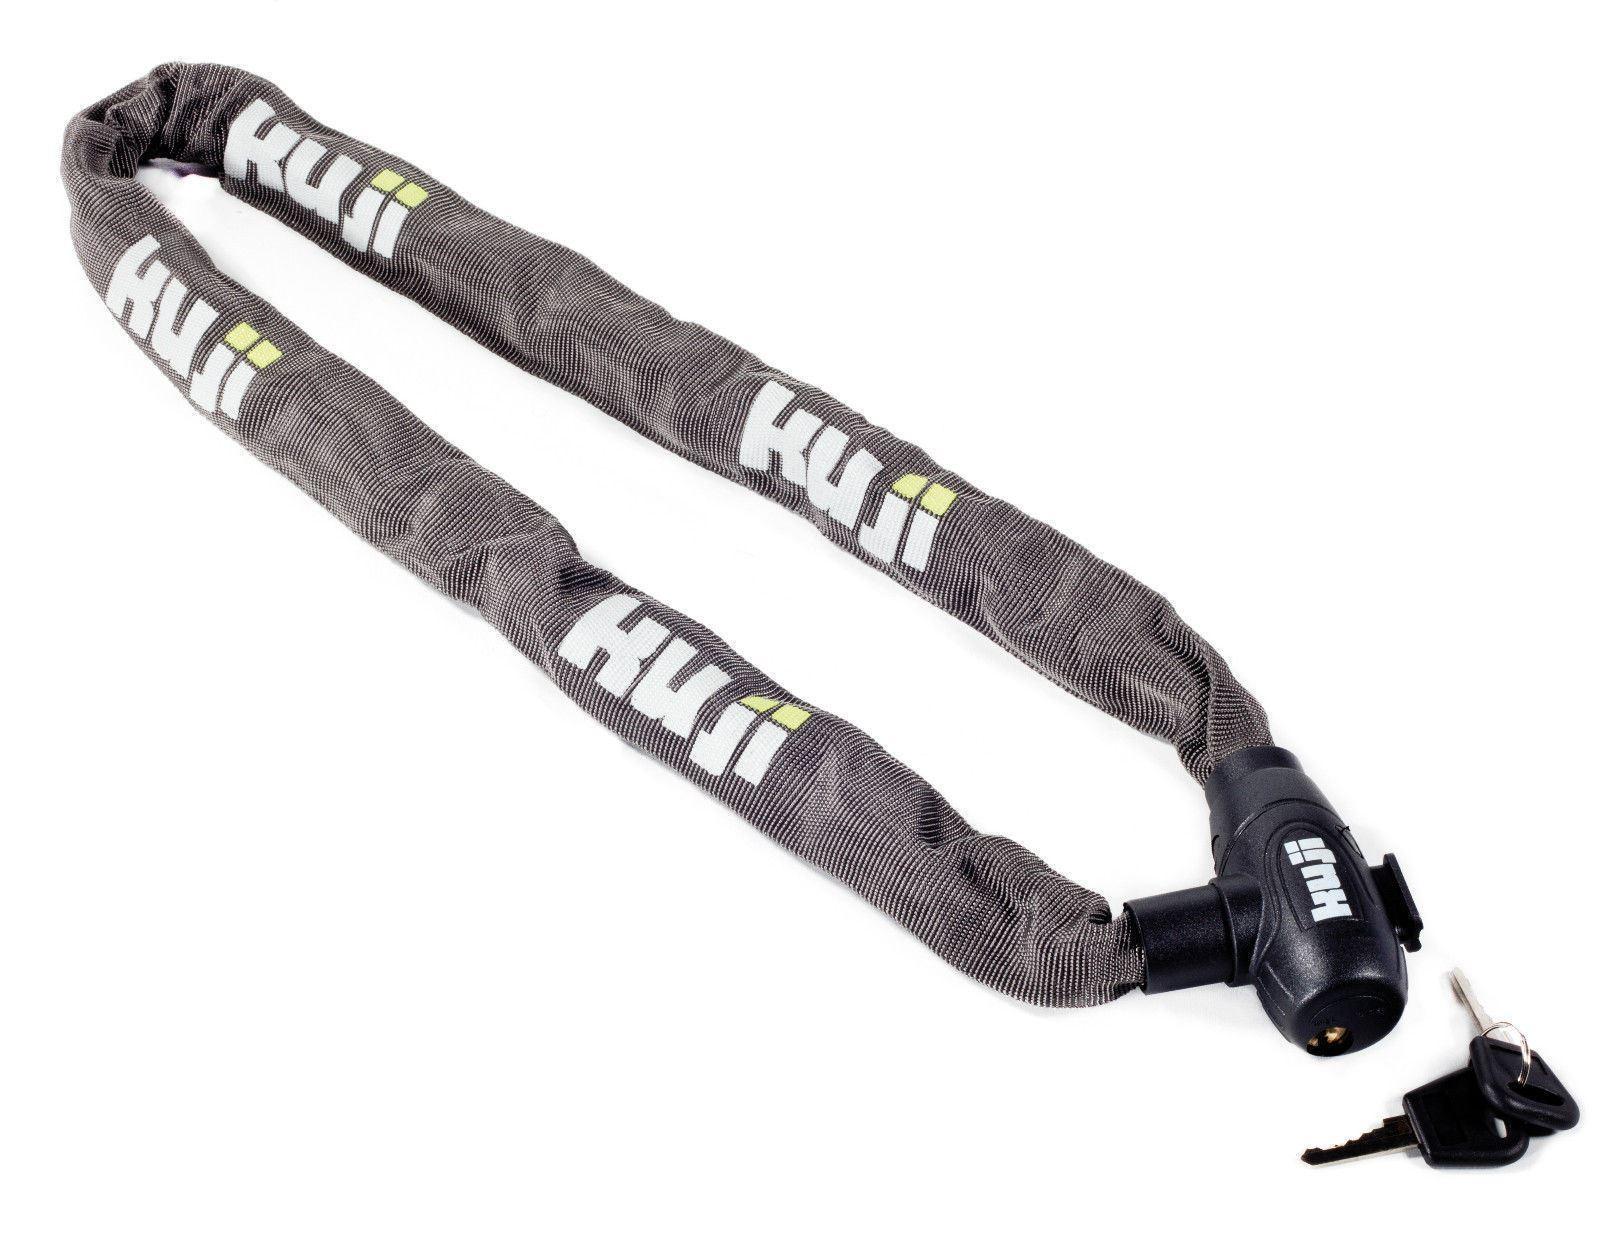 Mountain Bike MTB Bicycle Chain Lock 6.3mm x 1000mm Toughened steel with Bracket